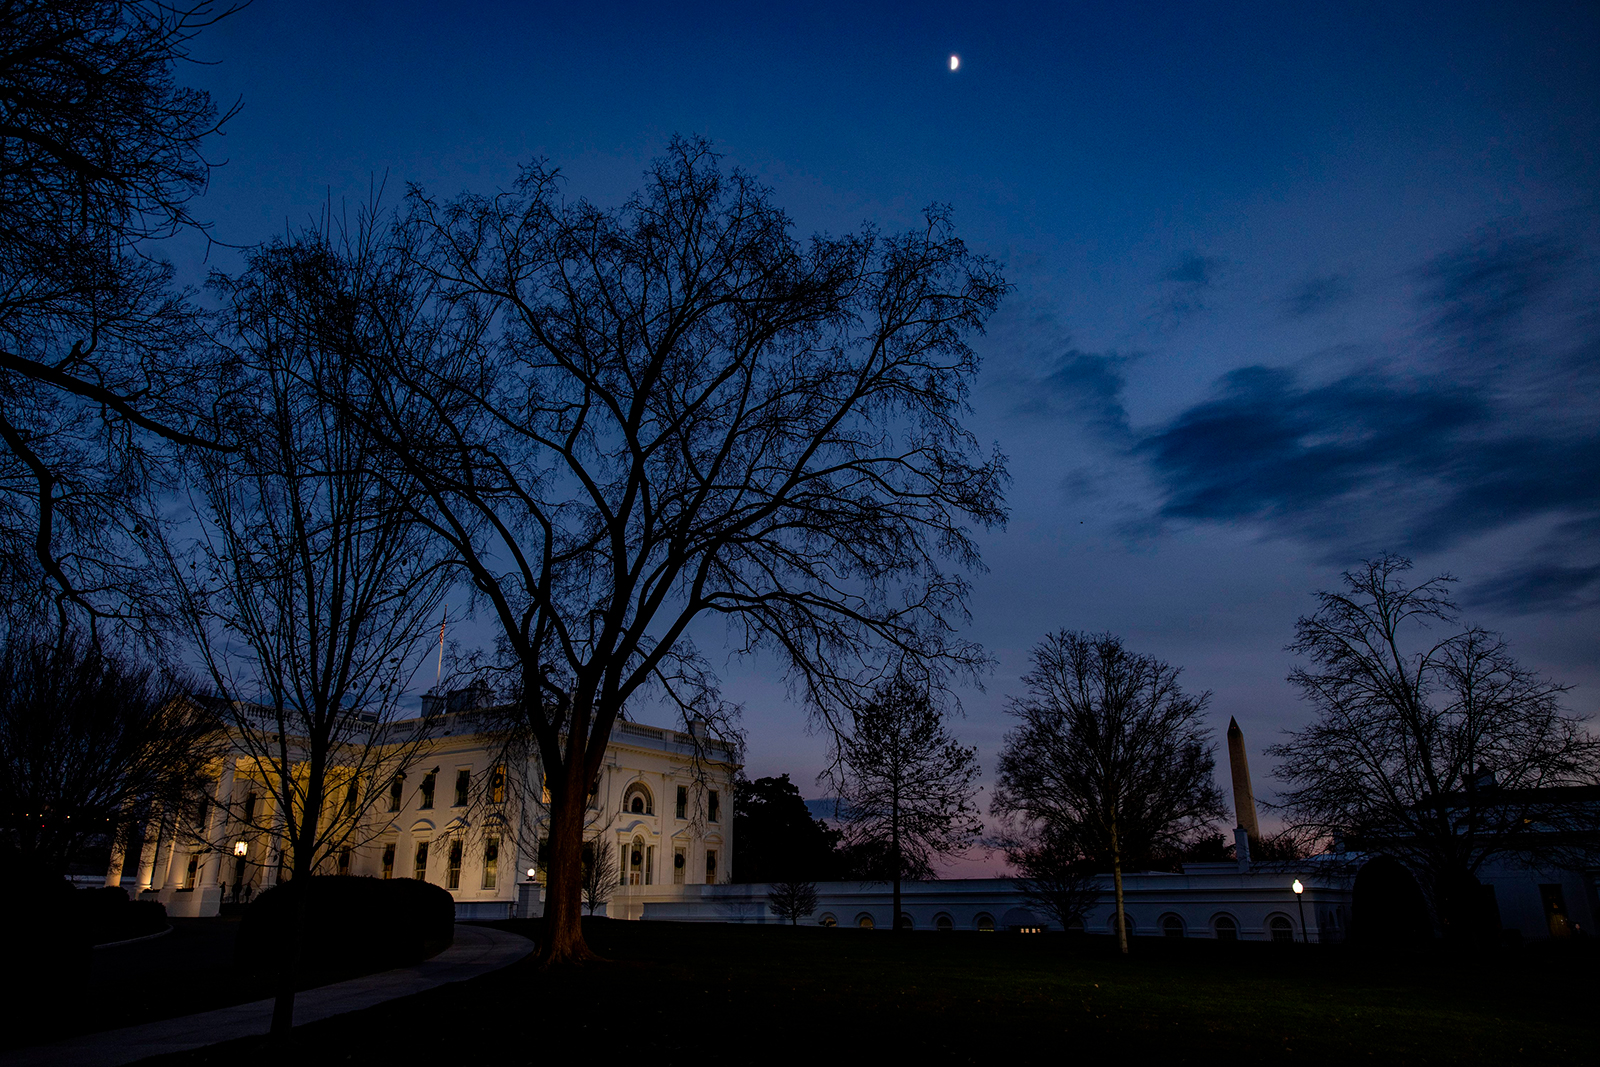 Dusk falls over the White House in Washington, DC on December 21.